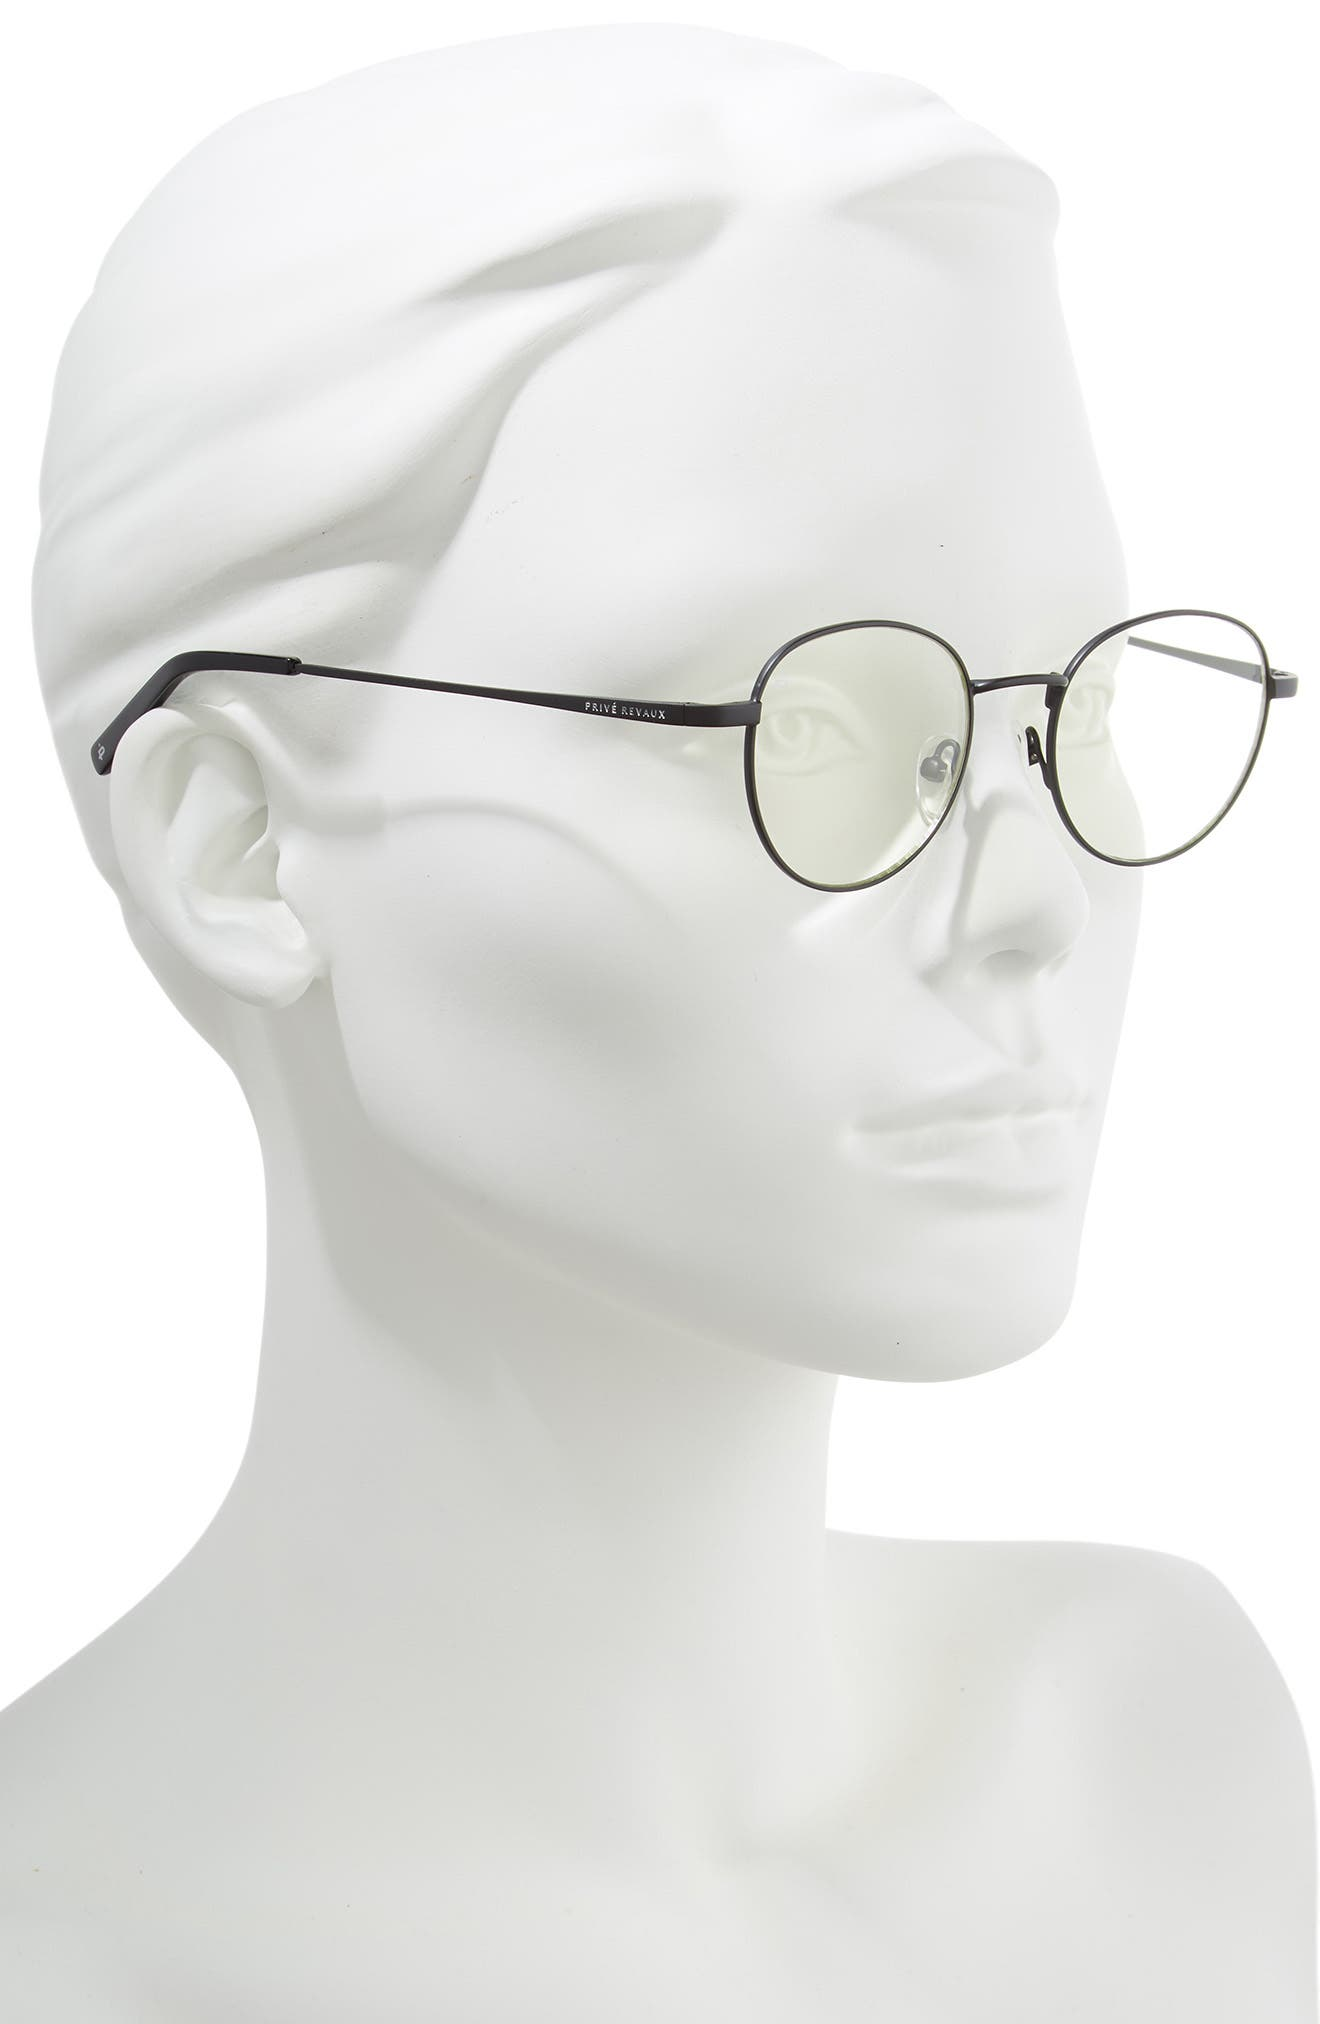 Privé Revaux The Machiavelli 45mm Blue Light Blocking Glasses,                             Alternate thumbnail 3, color,